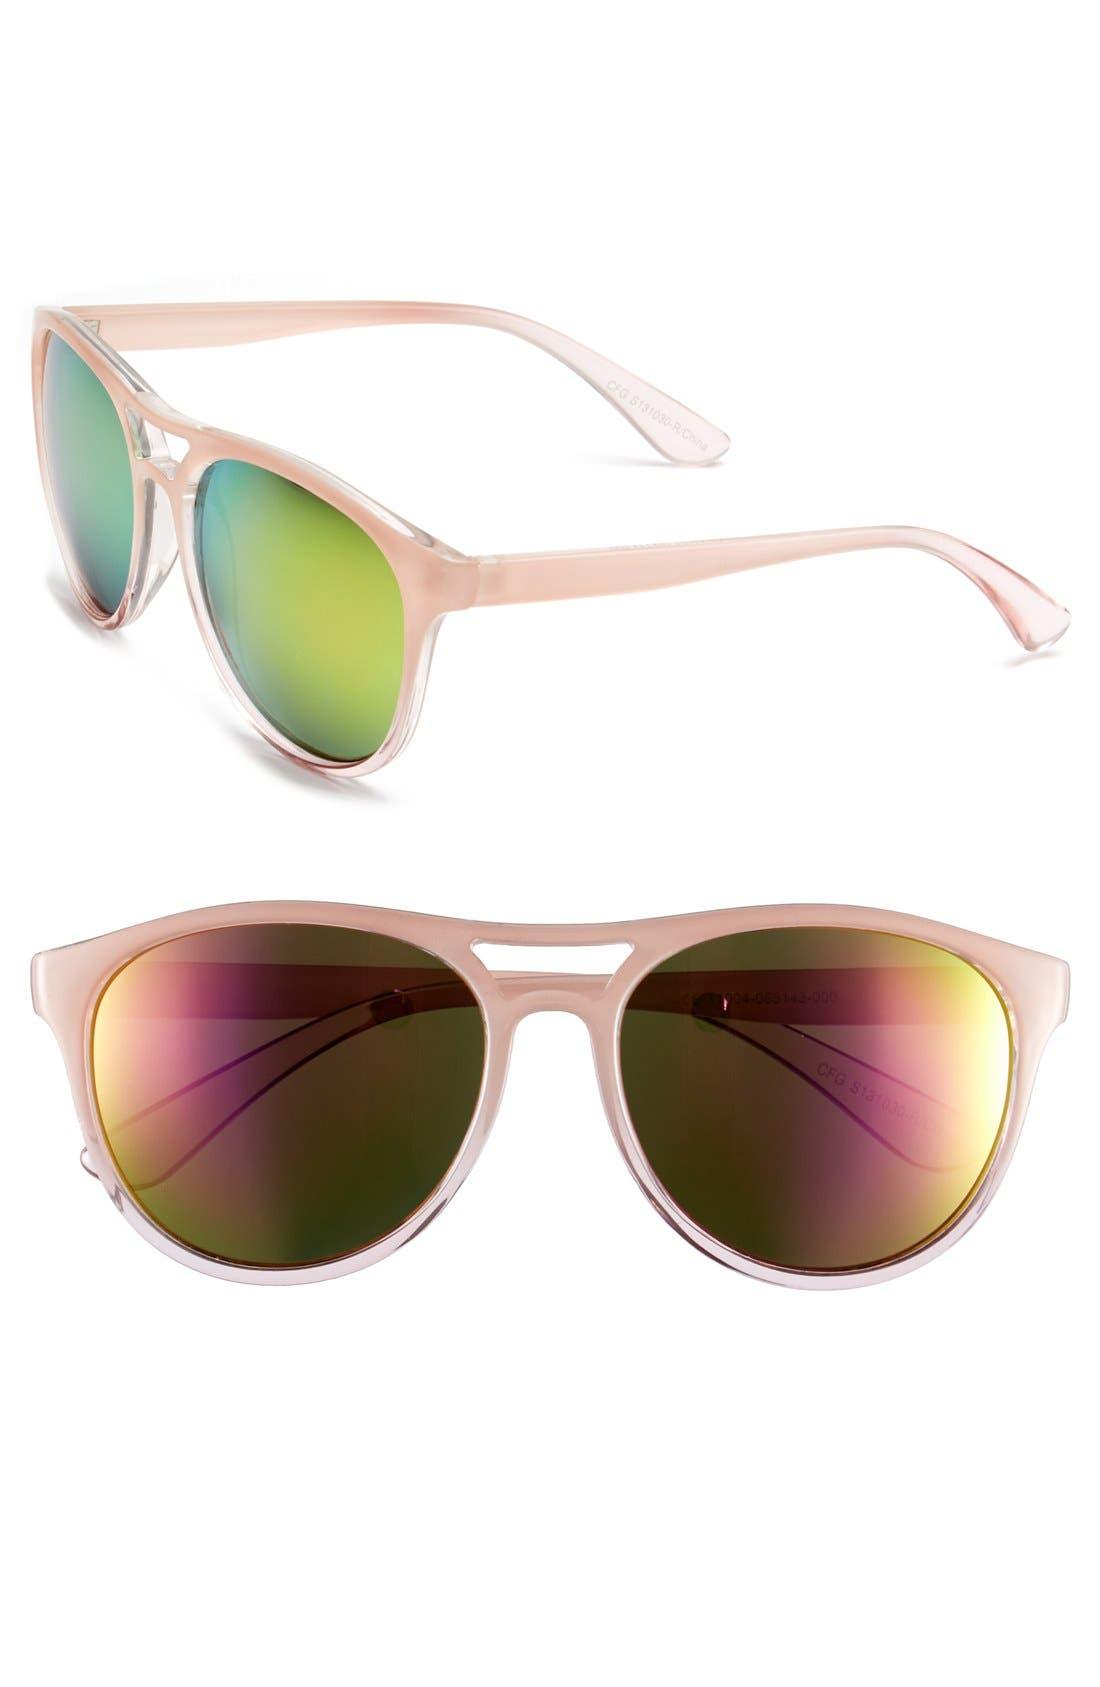 55mm Oversize Retro Sunglasses,                             Main thumbnail 1, color,                             Pink